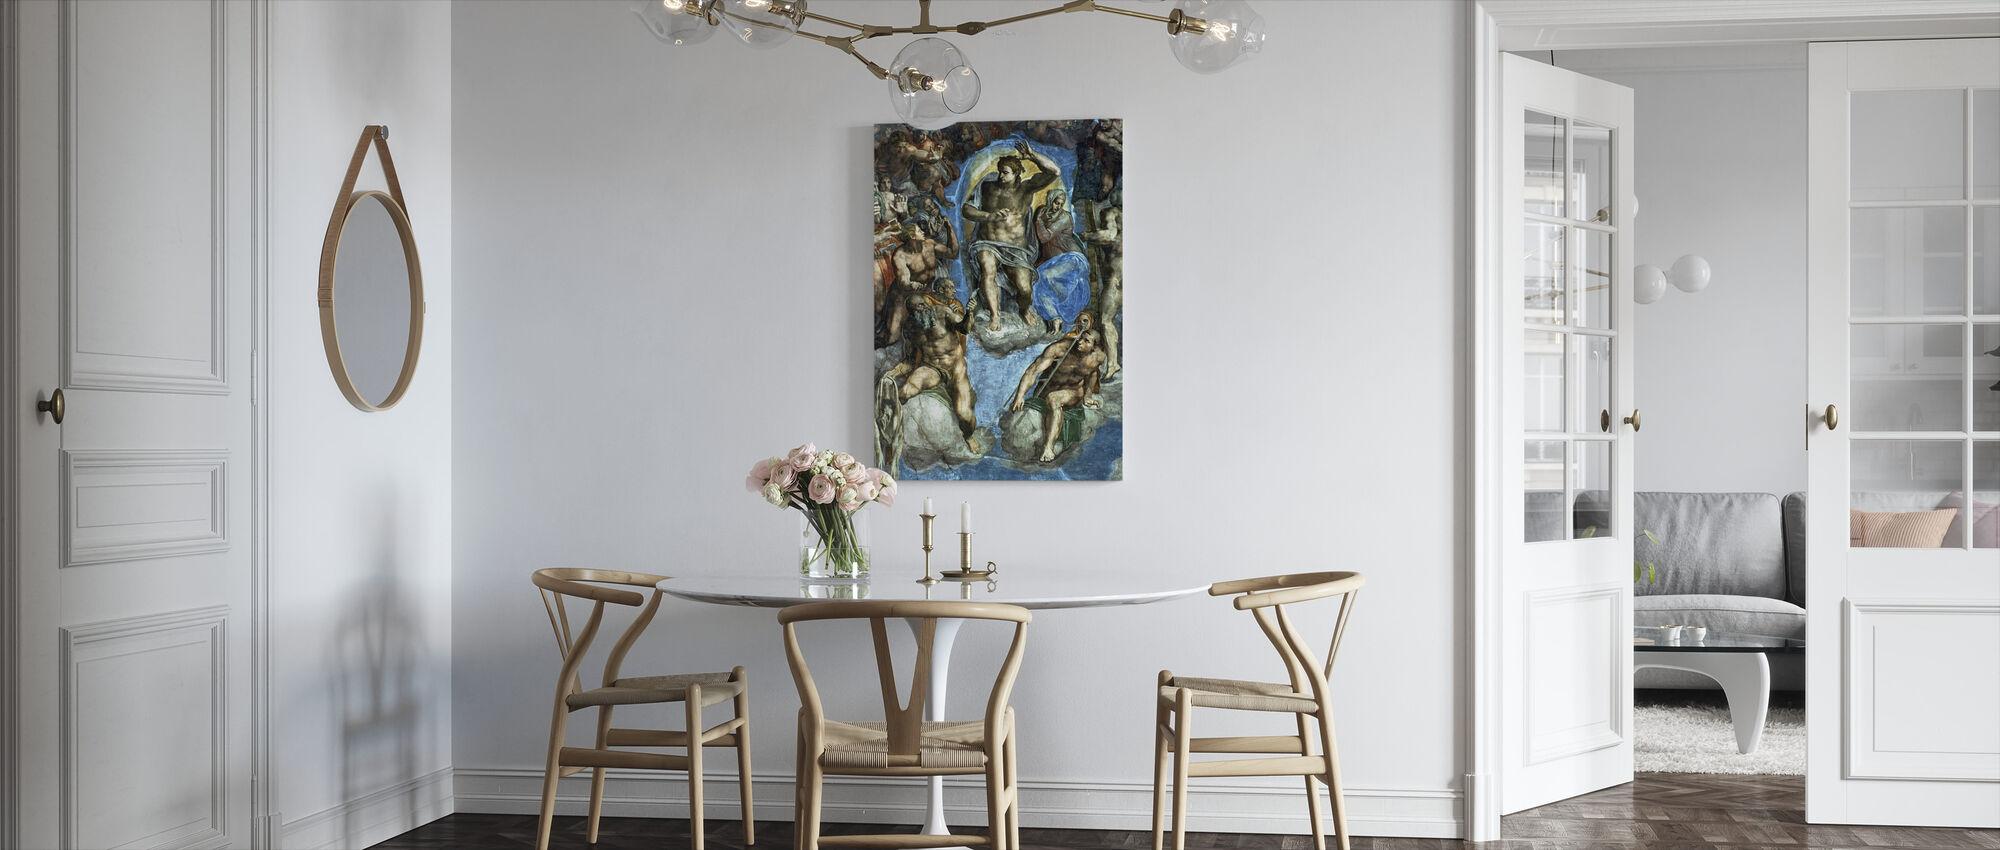 Last Judgement - Michelangelo Buonarroti - Canvas print - Kitchen